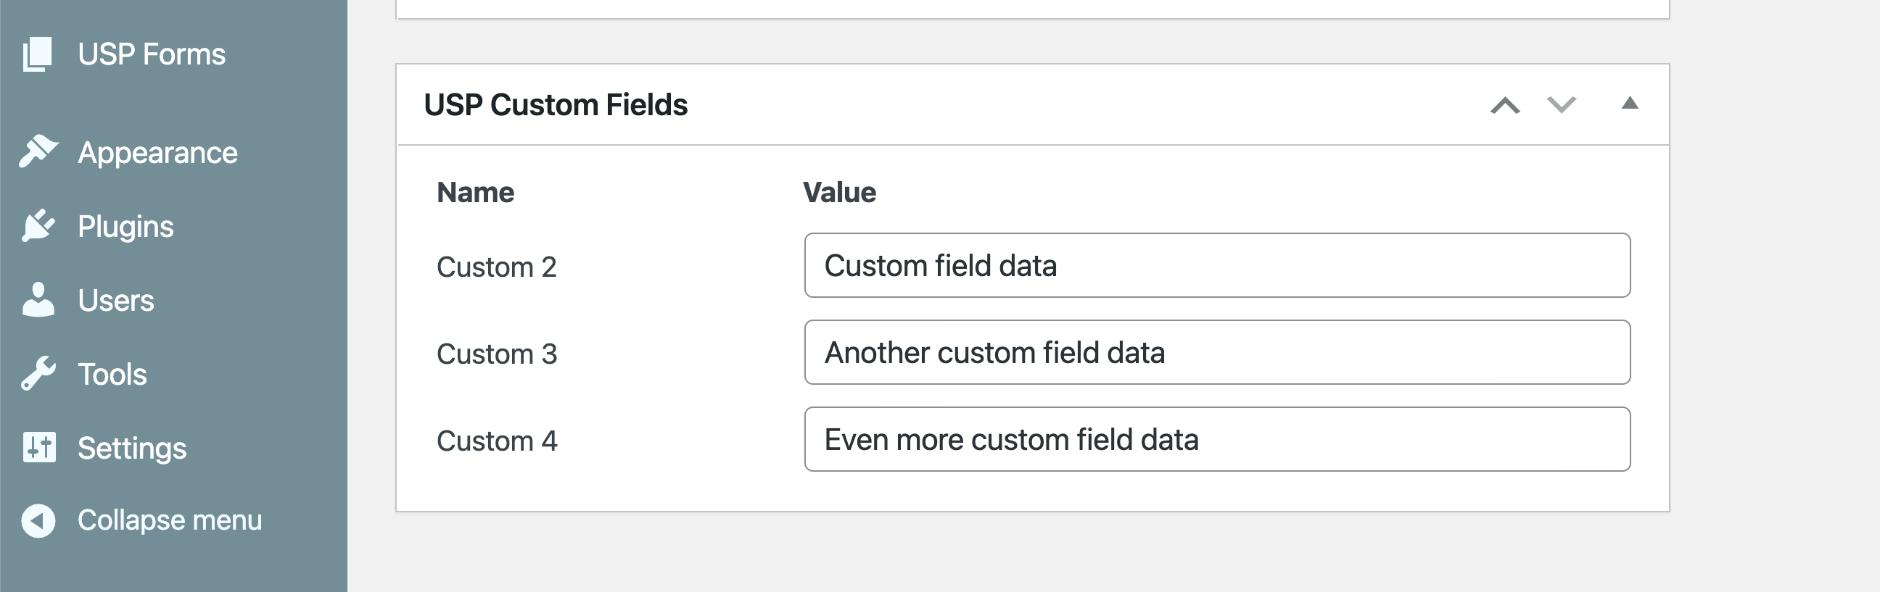 USP Pro - Meta Box UI for Custom Fields